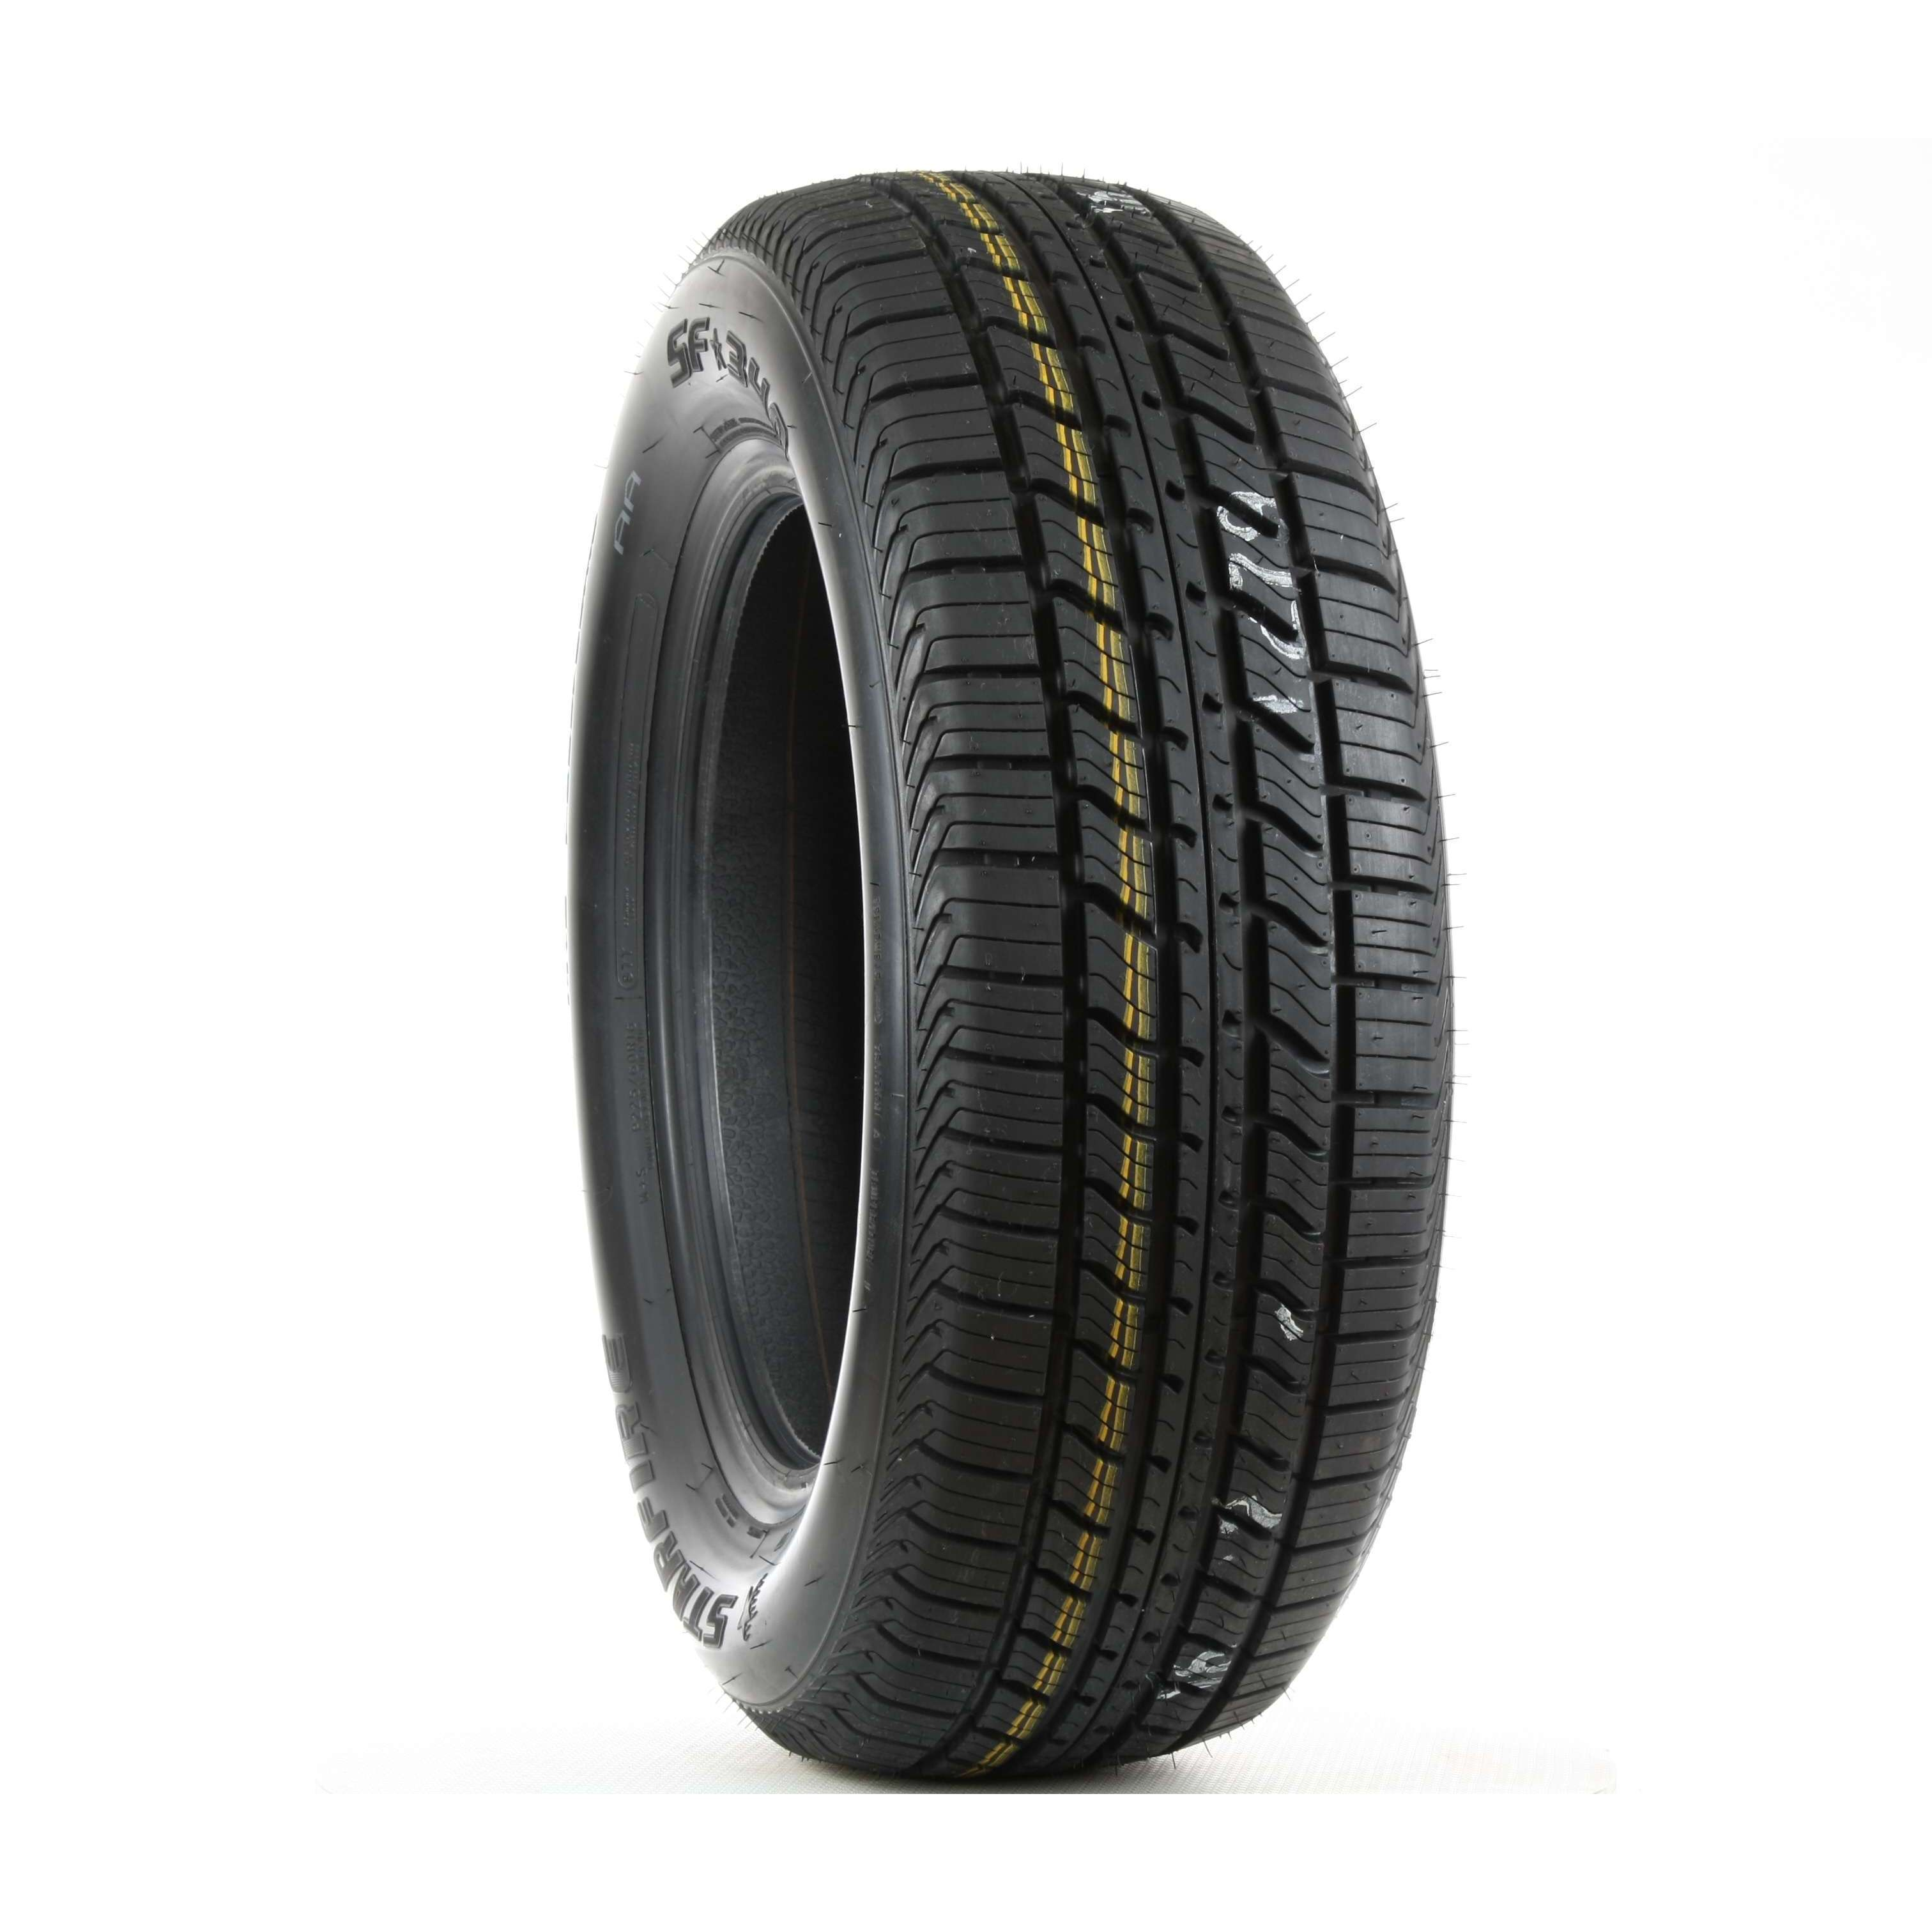 Starfire SF-340 All Season Tire - 215/60R16 94T (Black)